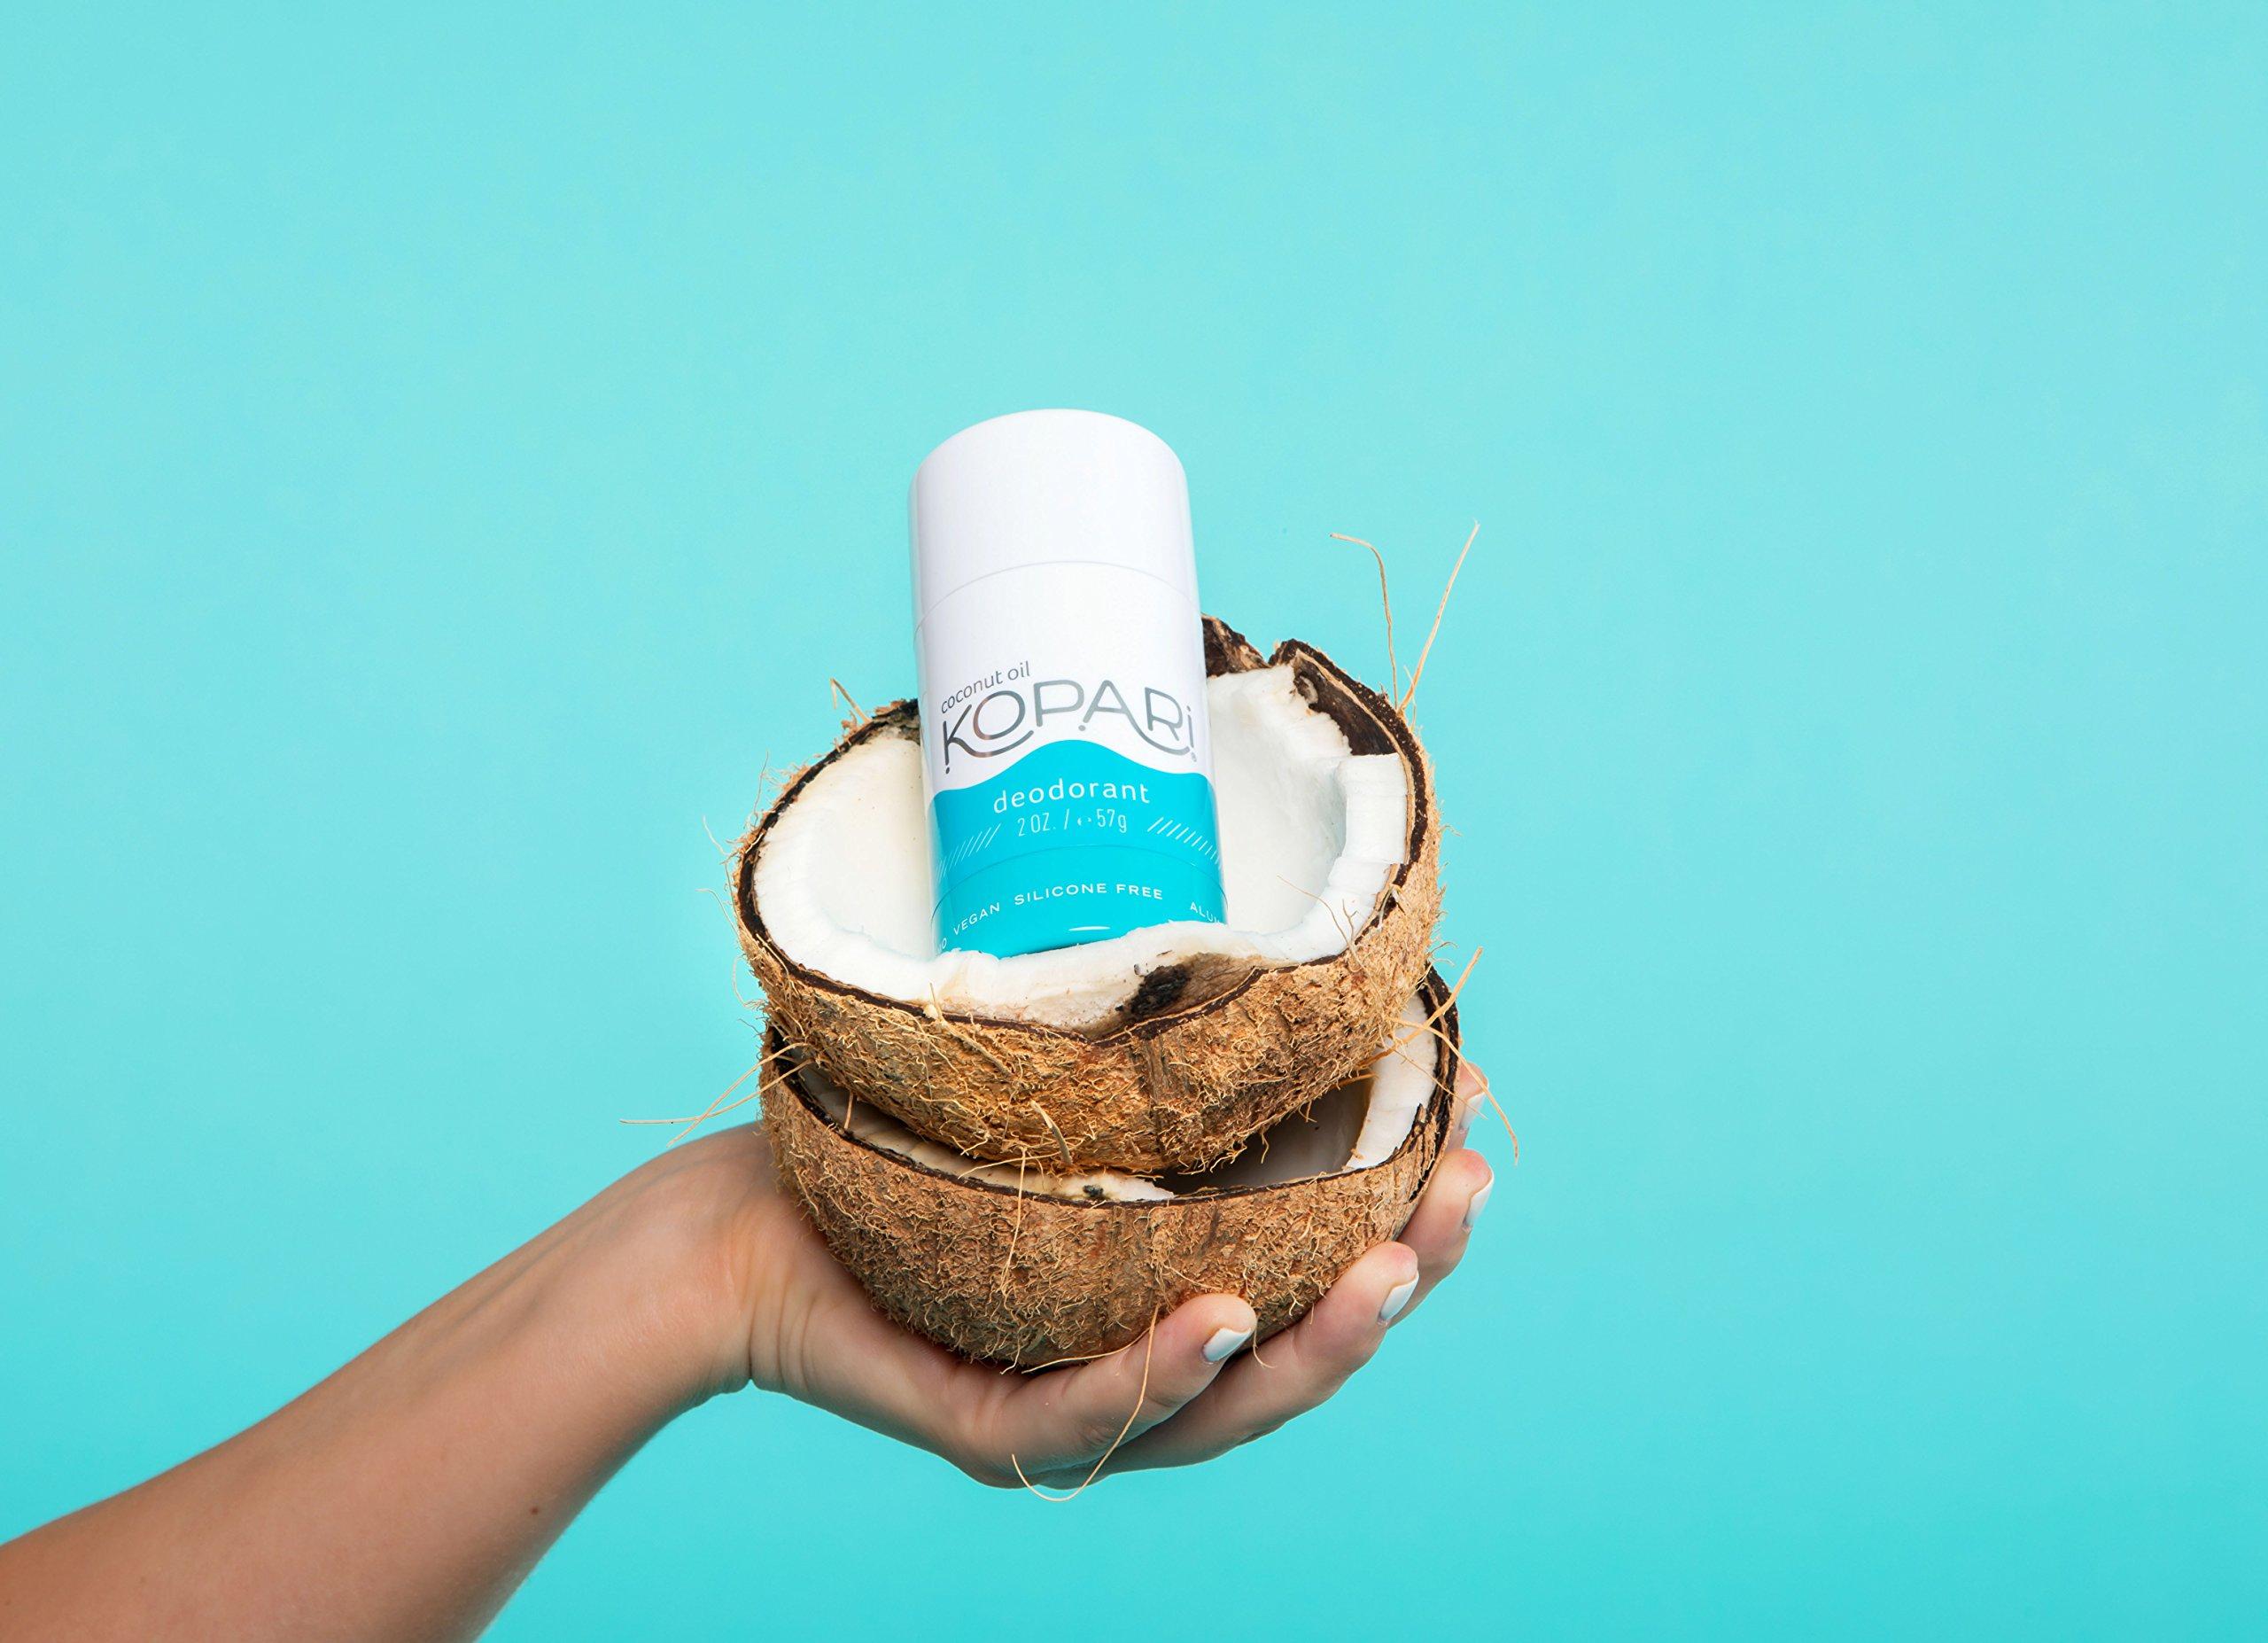 Kopari Aluminum-Free Deodorant | Non-Toxic, Paraben Free, Gluten Free & Cruelty Free Men's and Women's Deodorant | Made with Organic Coconut Oil | 2.0 oz by Kopari (Image #3)